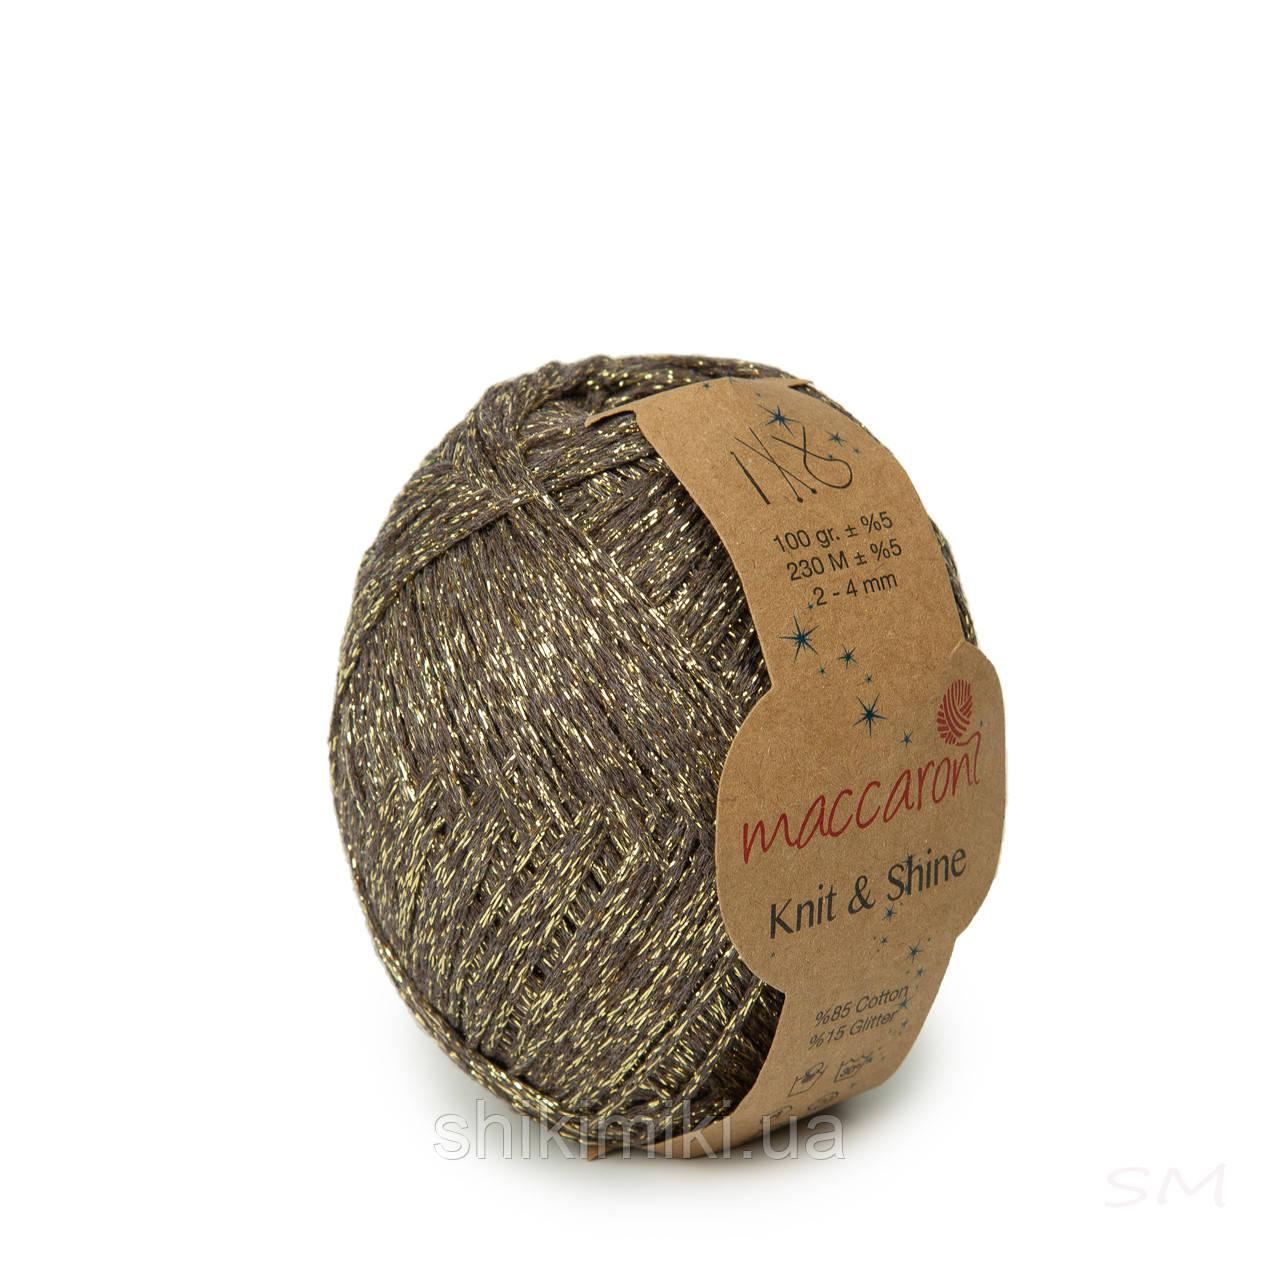 Трикотажный шнур с люрексом Knit & Shine, цвет Какао